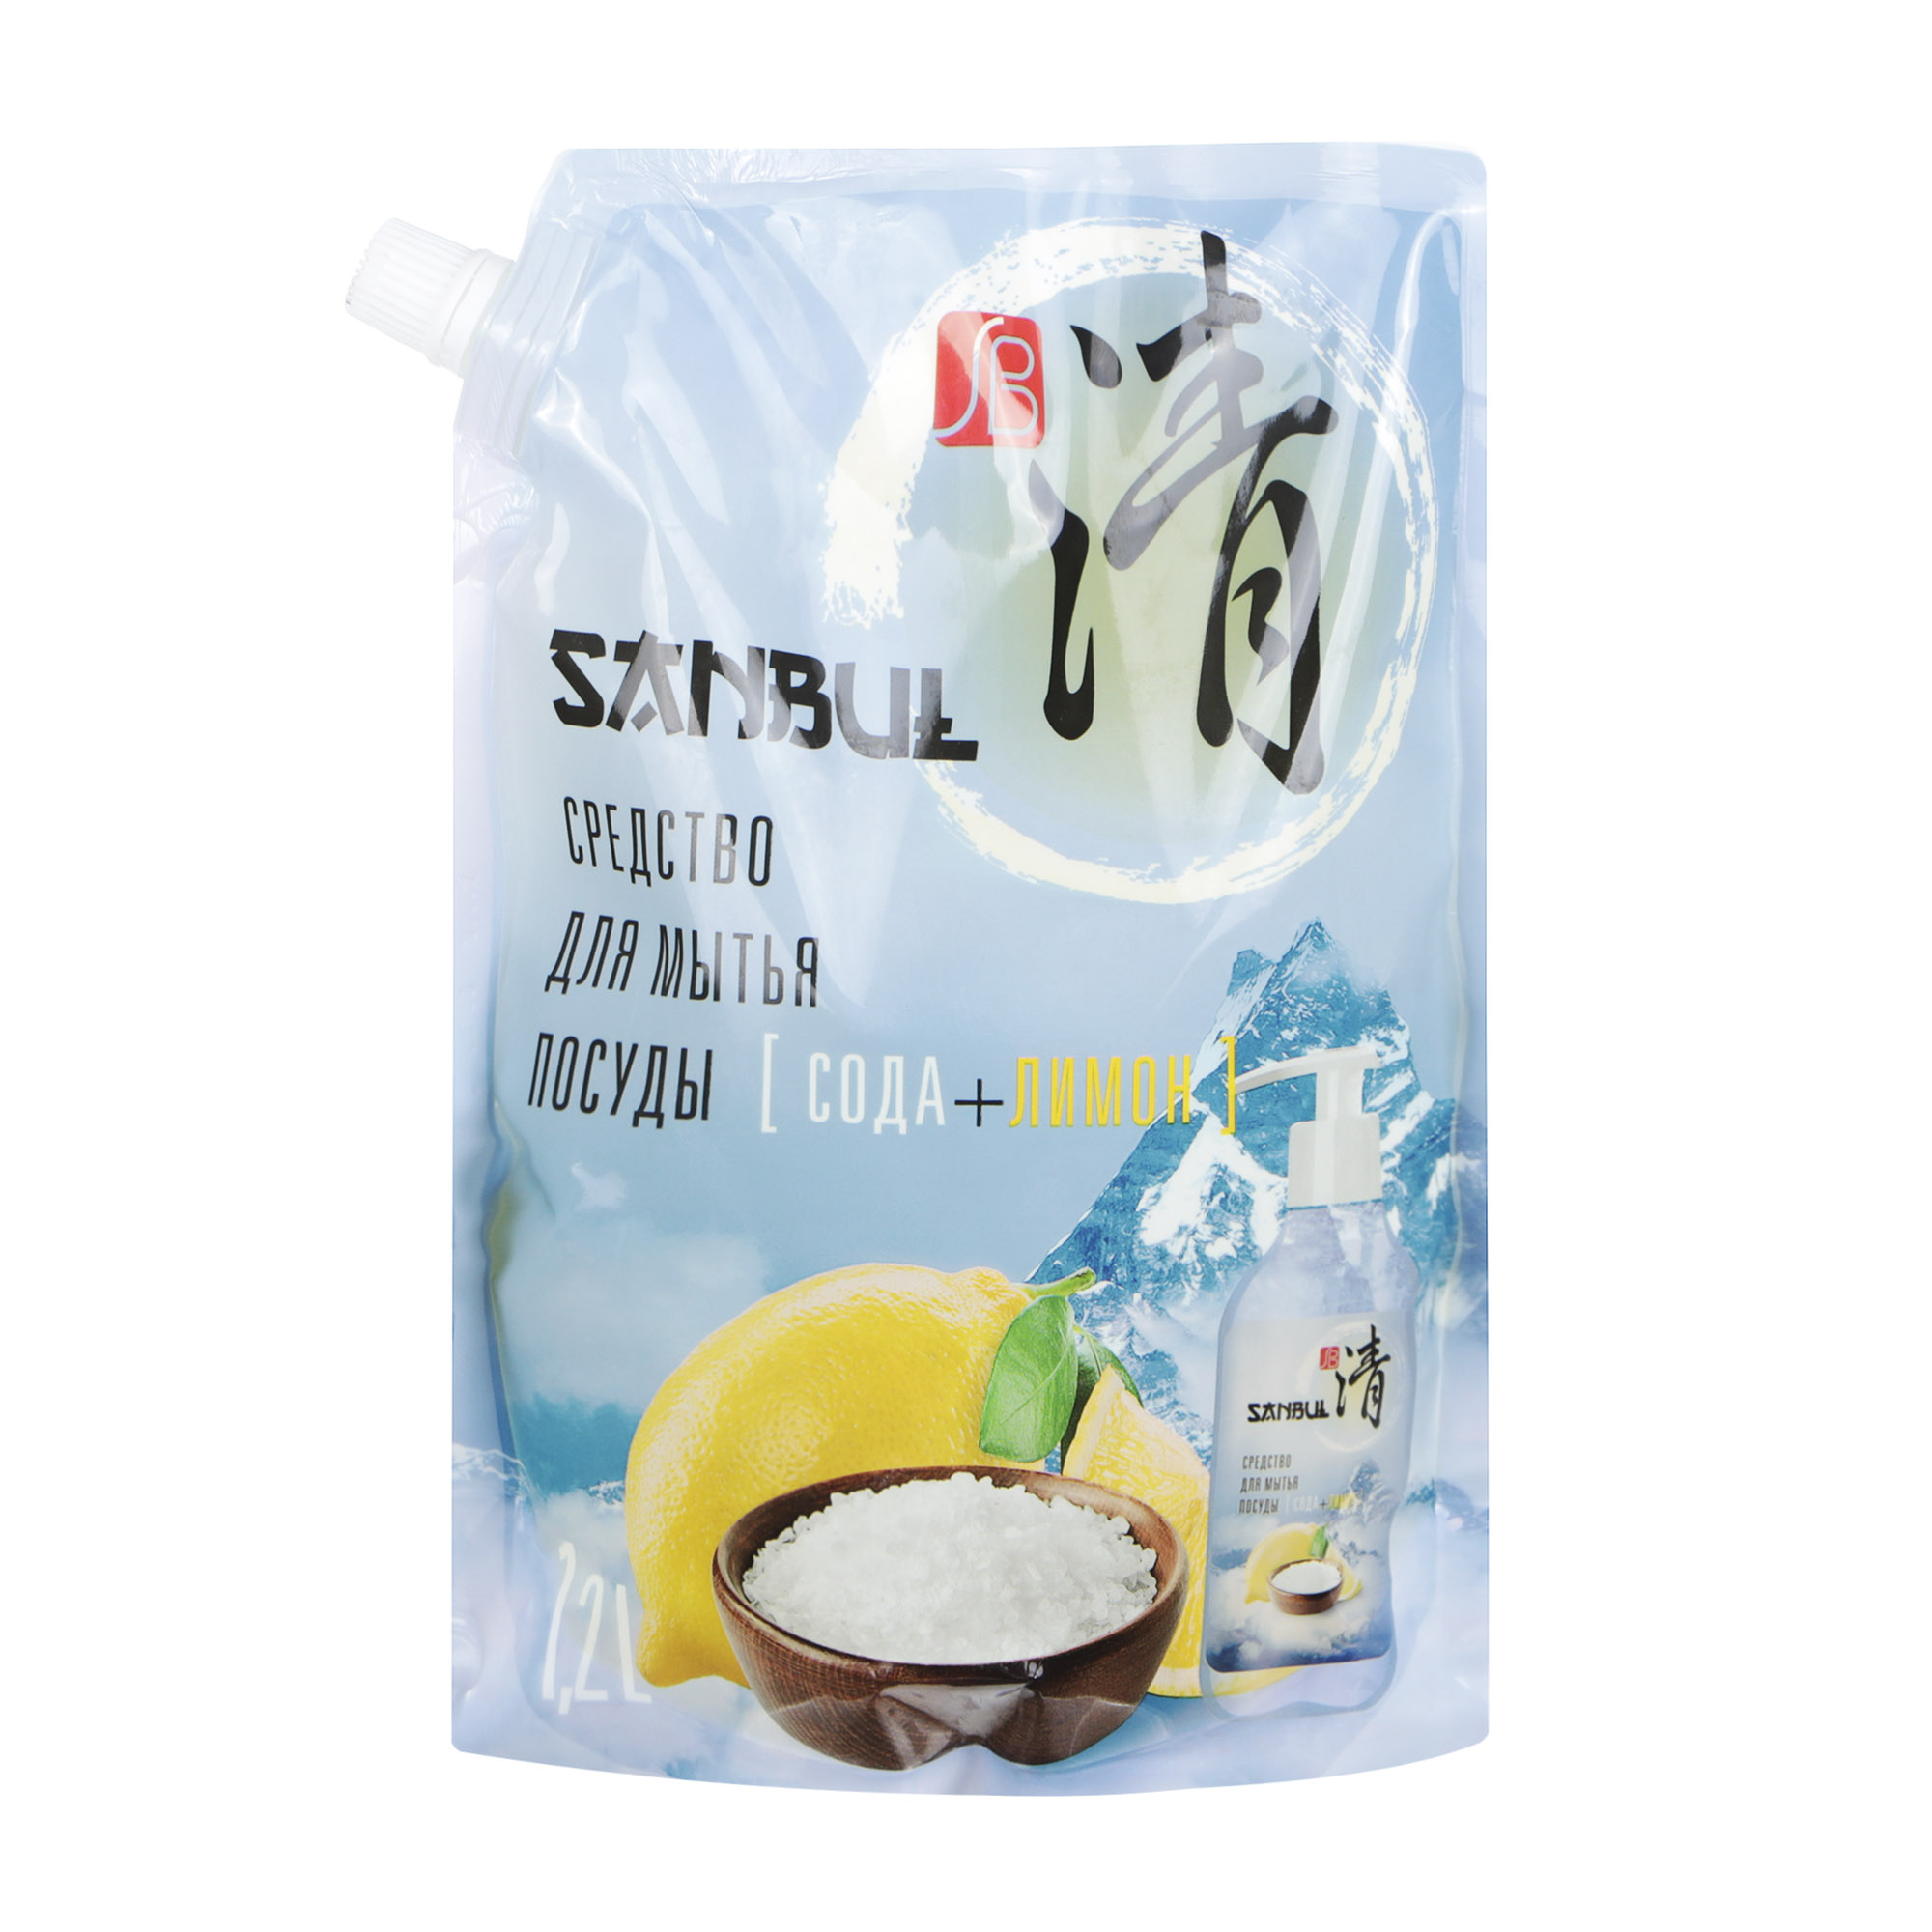 Средство для мытья посуды SANBUL Сода+Лимон 1,2 л